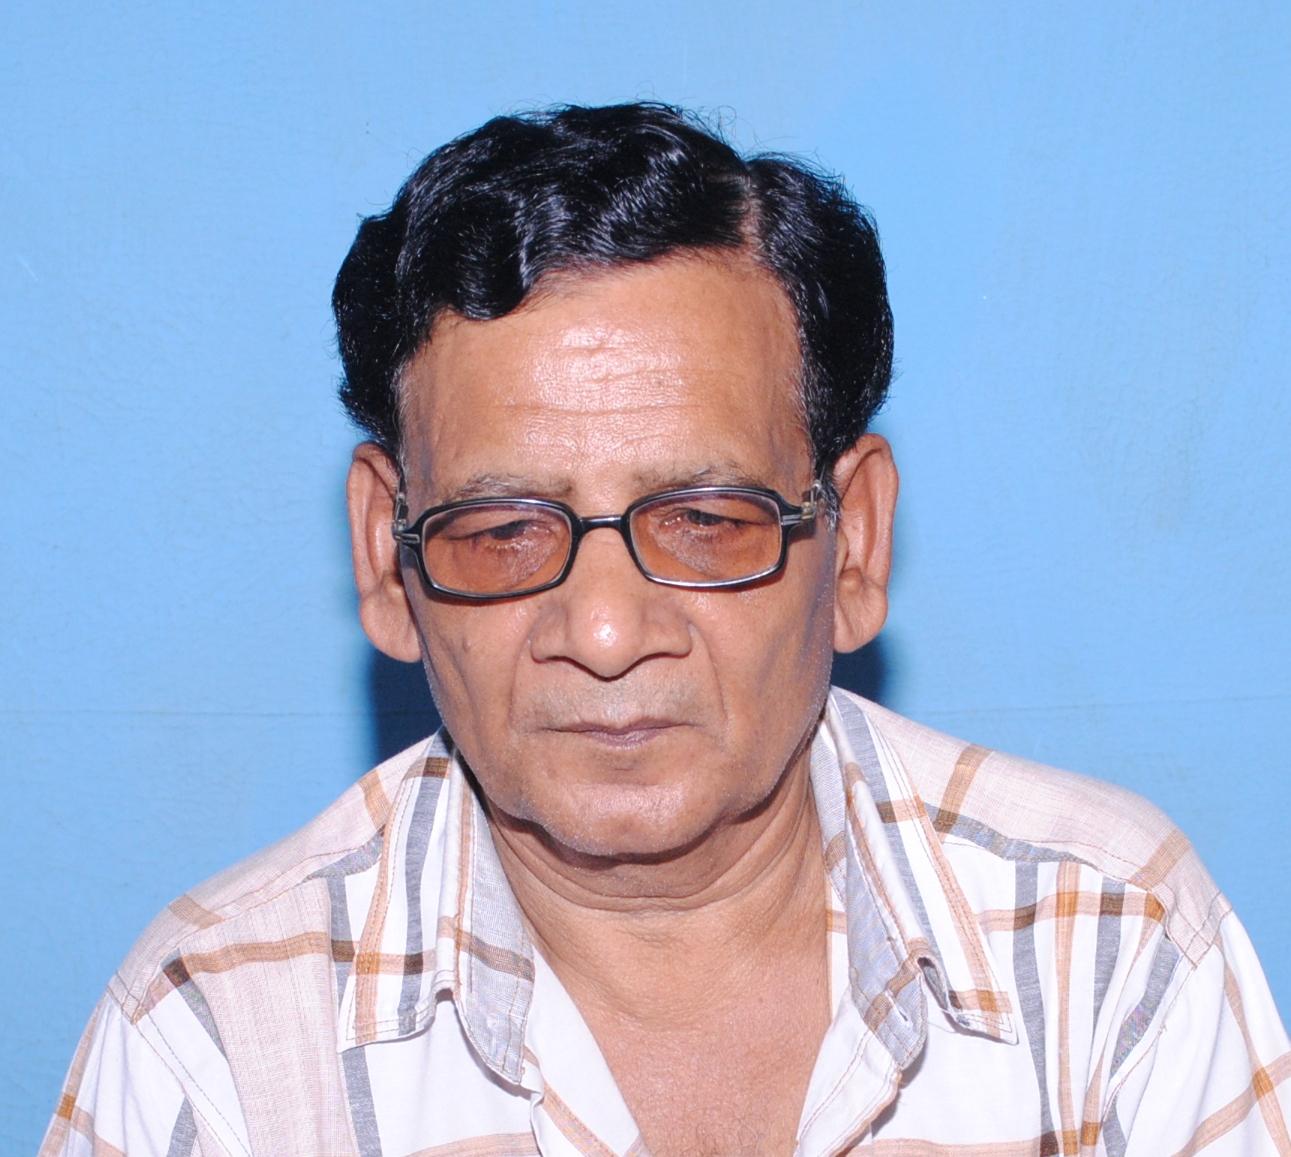 रामेशराज तेवेरिकार एक महान साहित्यकार एवं महान समाज सुधारक थे : प्रधानाचार्य नरेन्द्र कुमार मिश्र